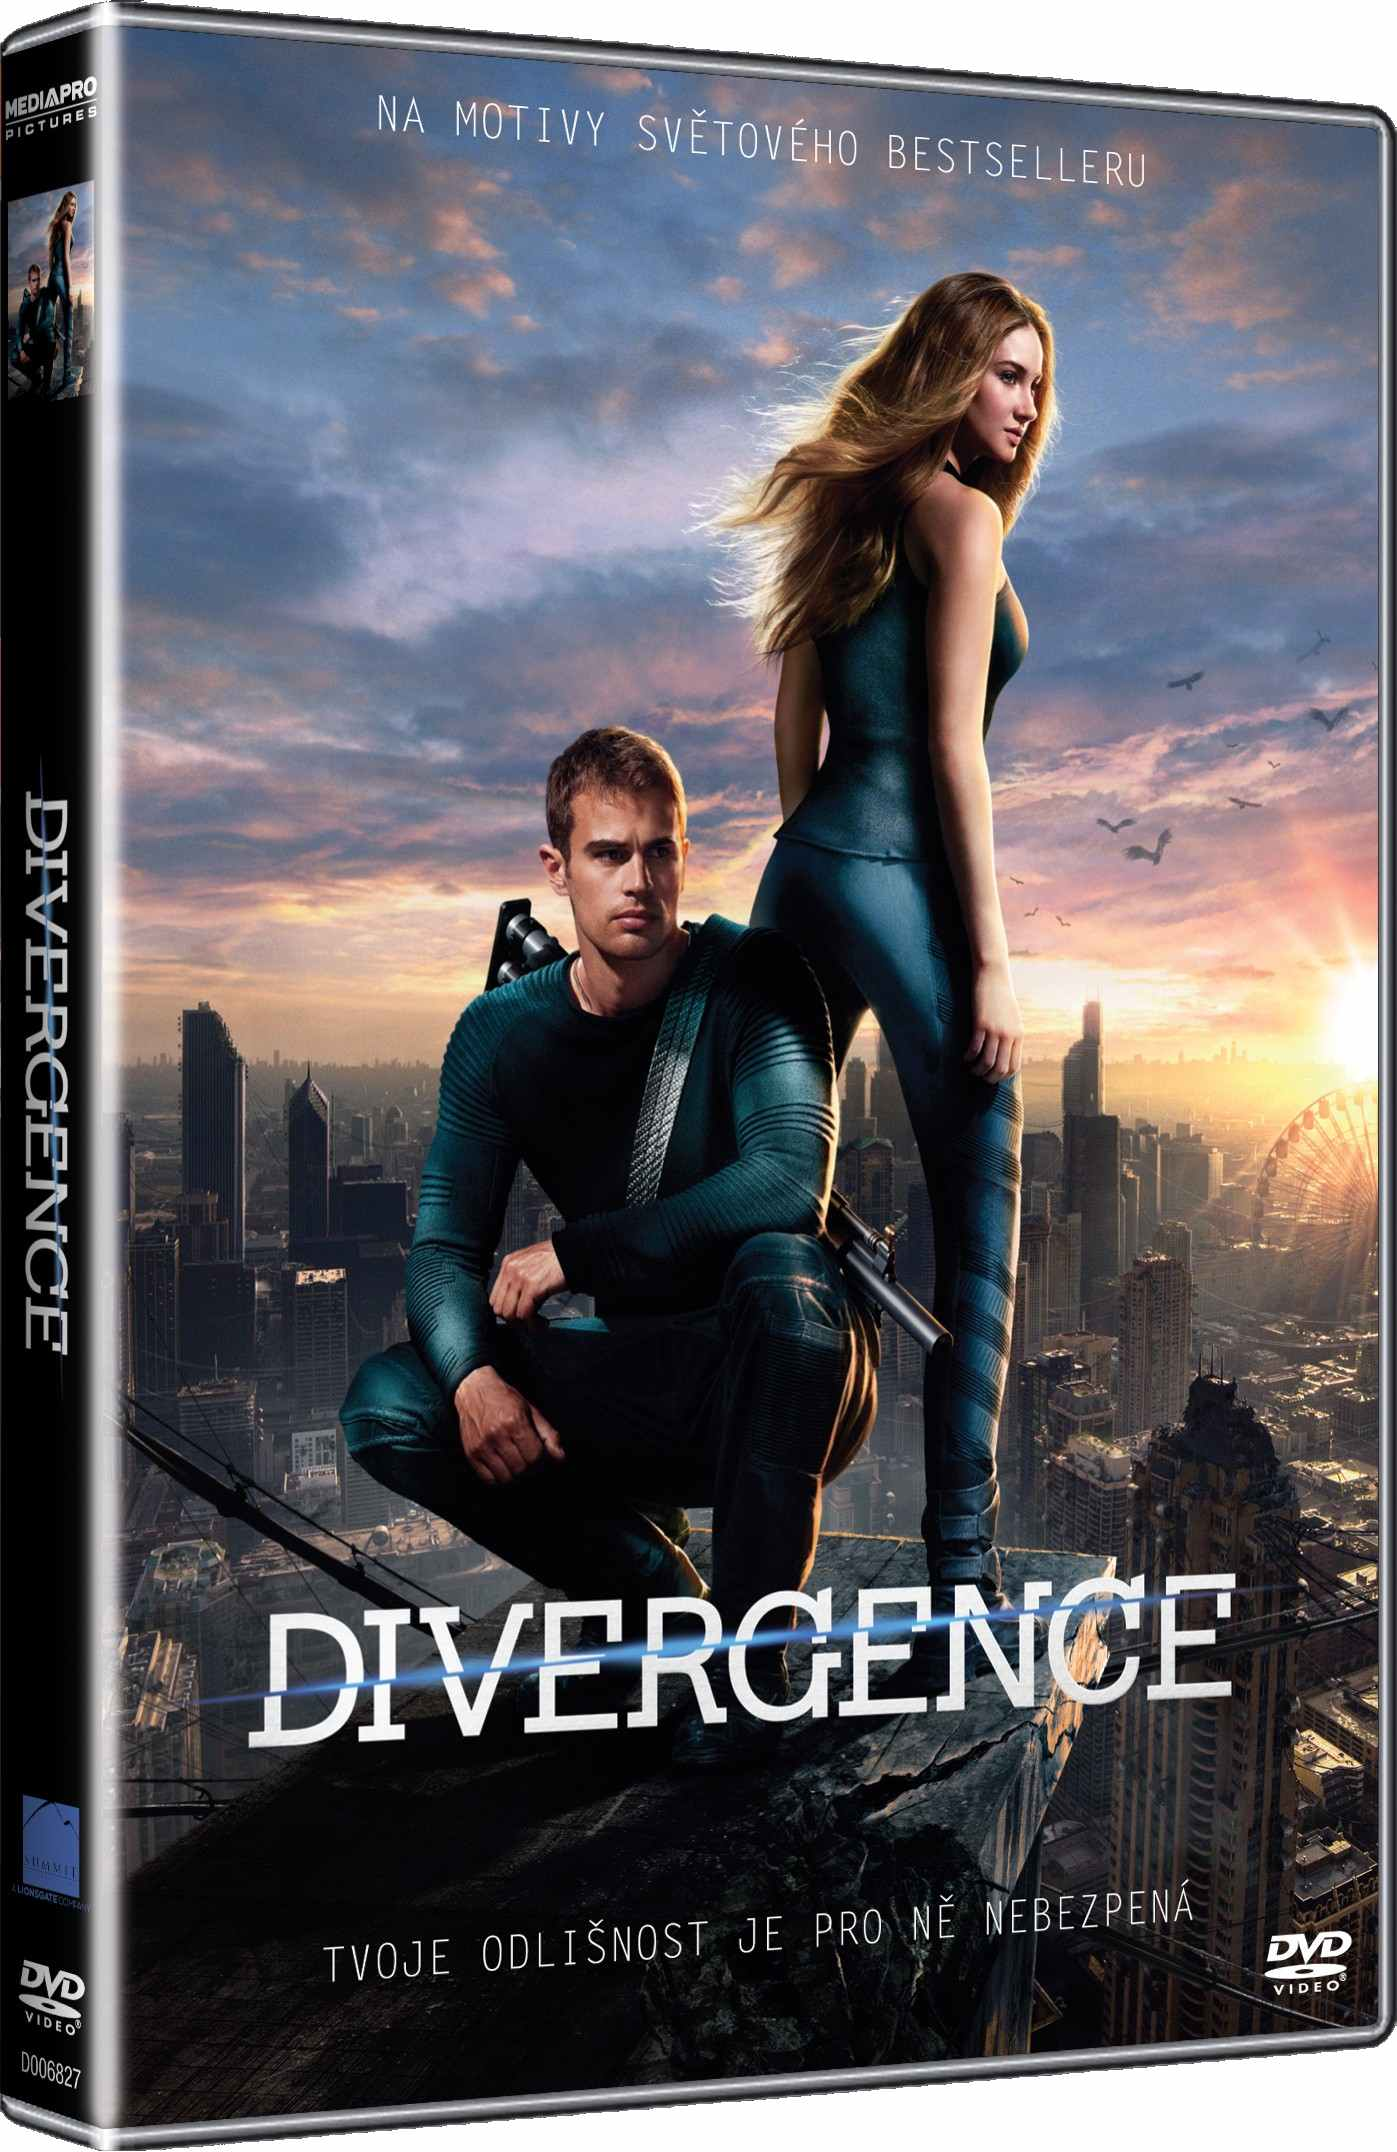 DIVERGENCE - DVD